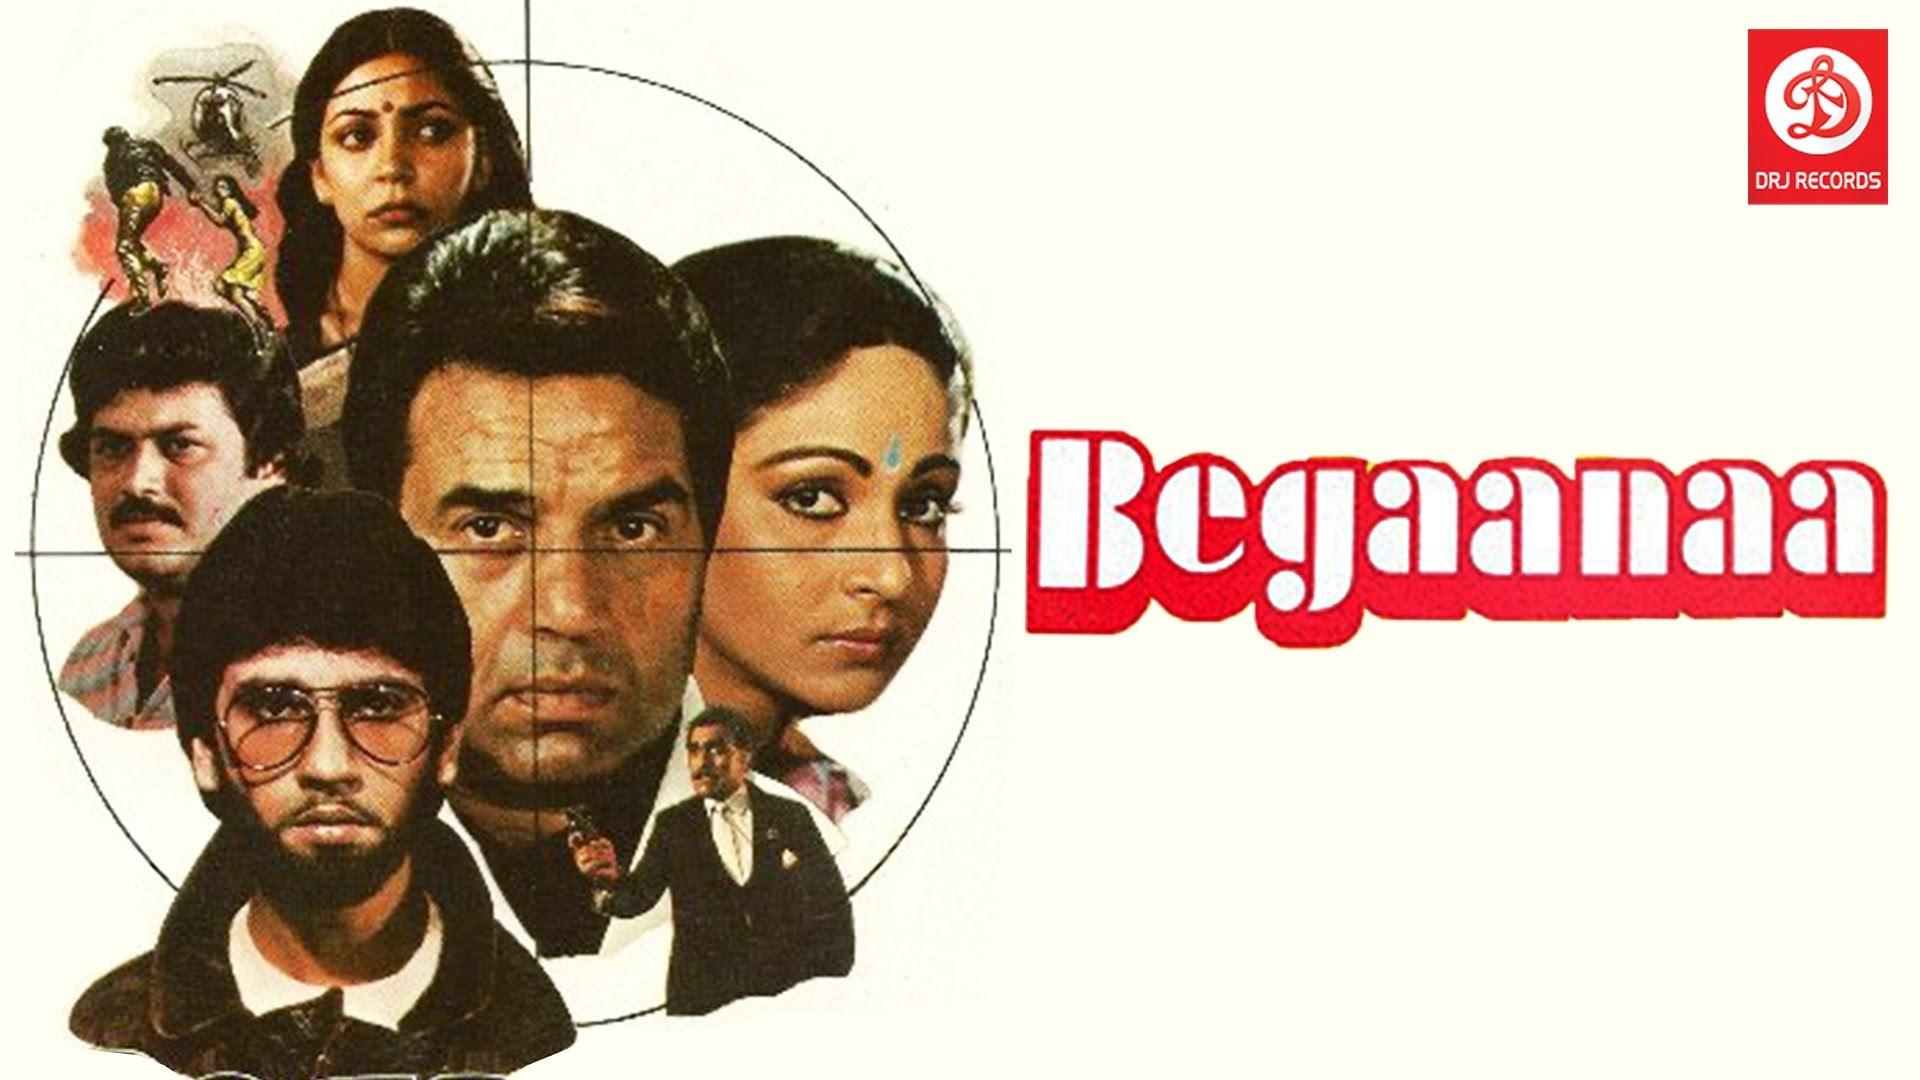 Begaana (1986) || Kumar Gaurav, Dharmendra, Rati Agnihotri, Deepti Naval,  Raj Kiran